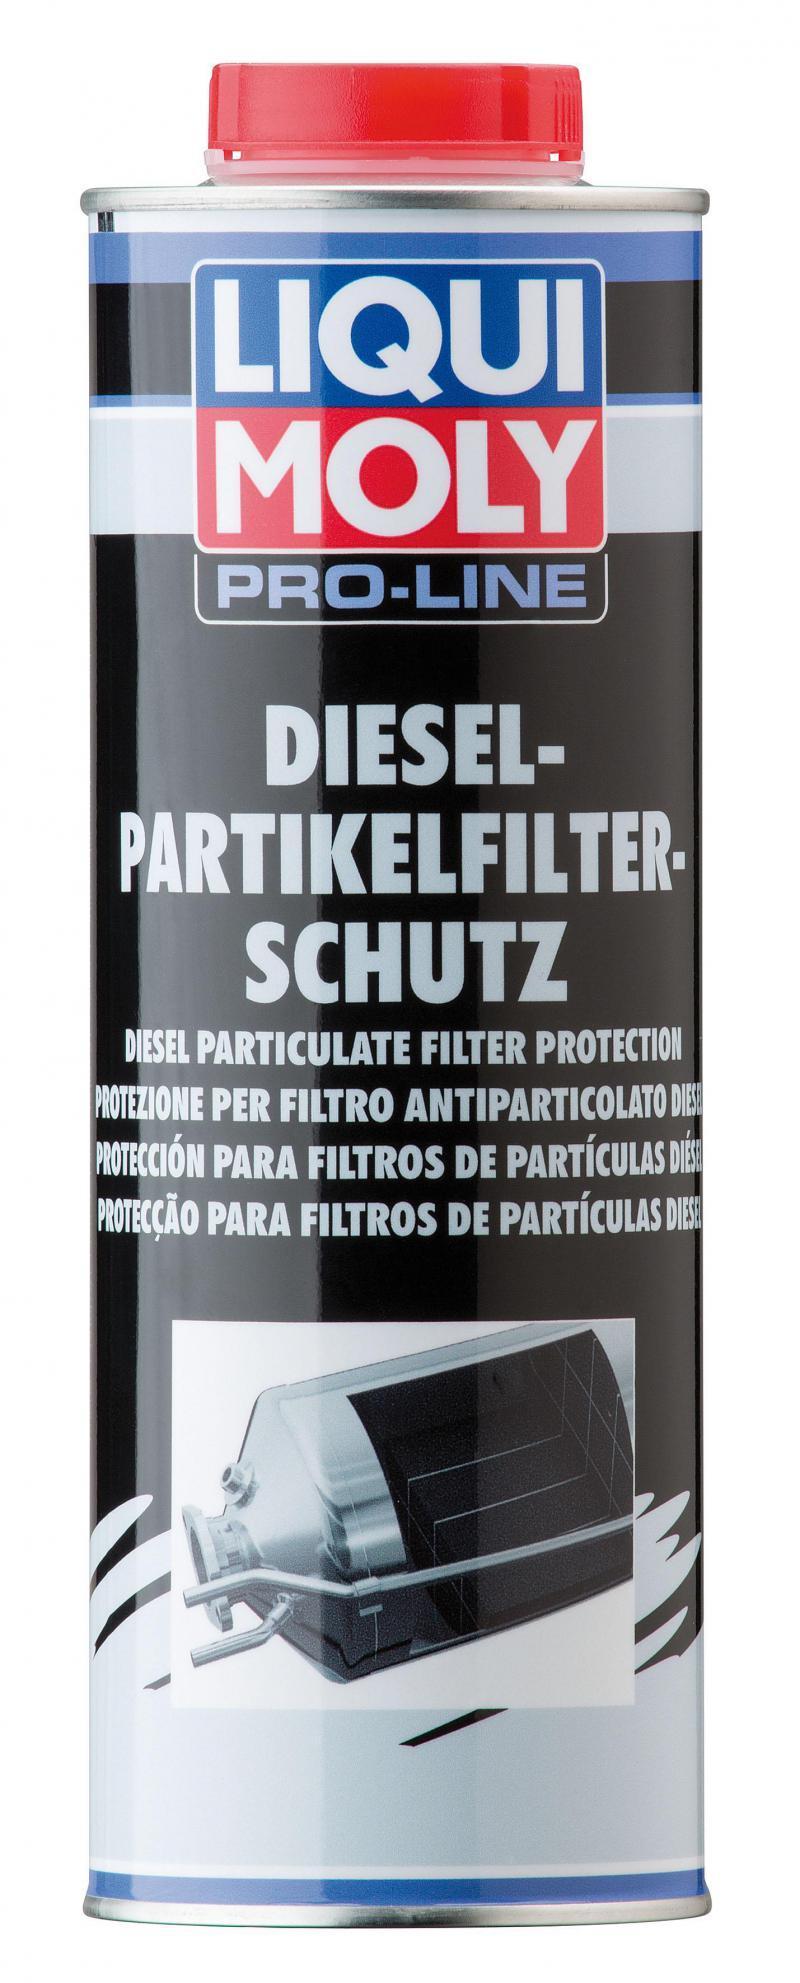 liqui moly pro line dieselpartikelfilter schutz 1l dose additiv autoteile walter schork gmbh. Black Bedroom Furniture Sets. Home Design Ideas